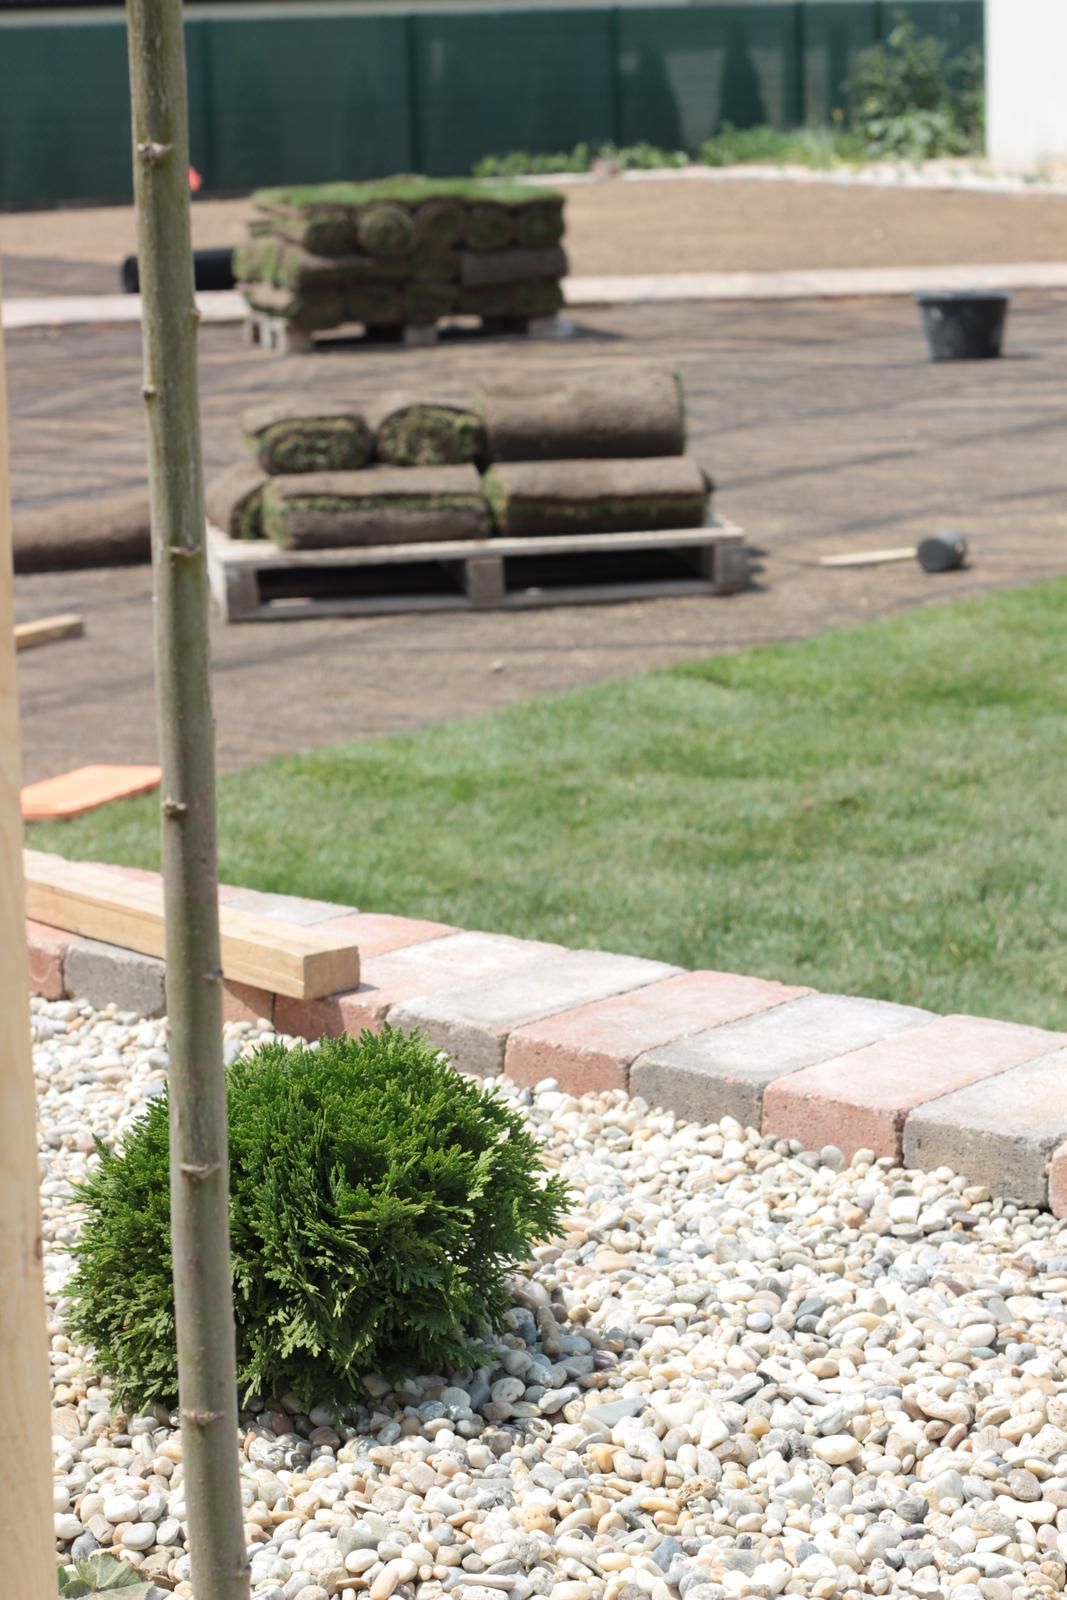 Exteriér - záhrada - Obrázok č. 44